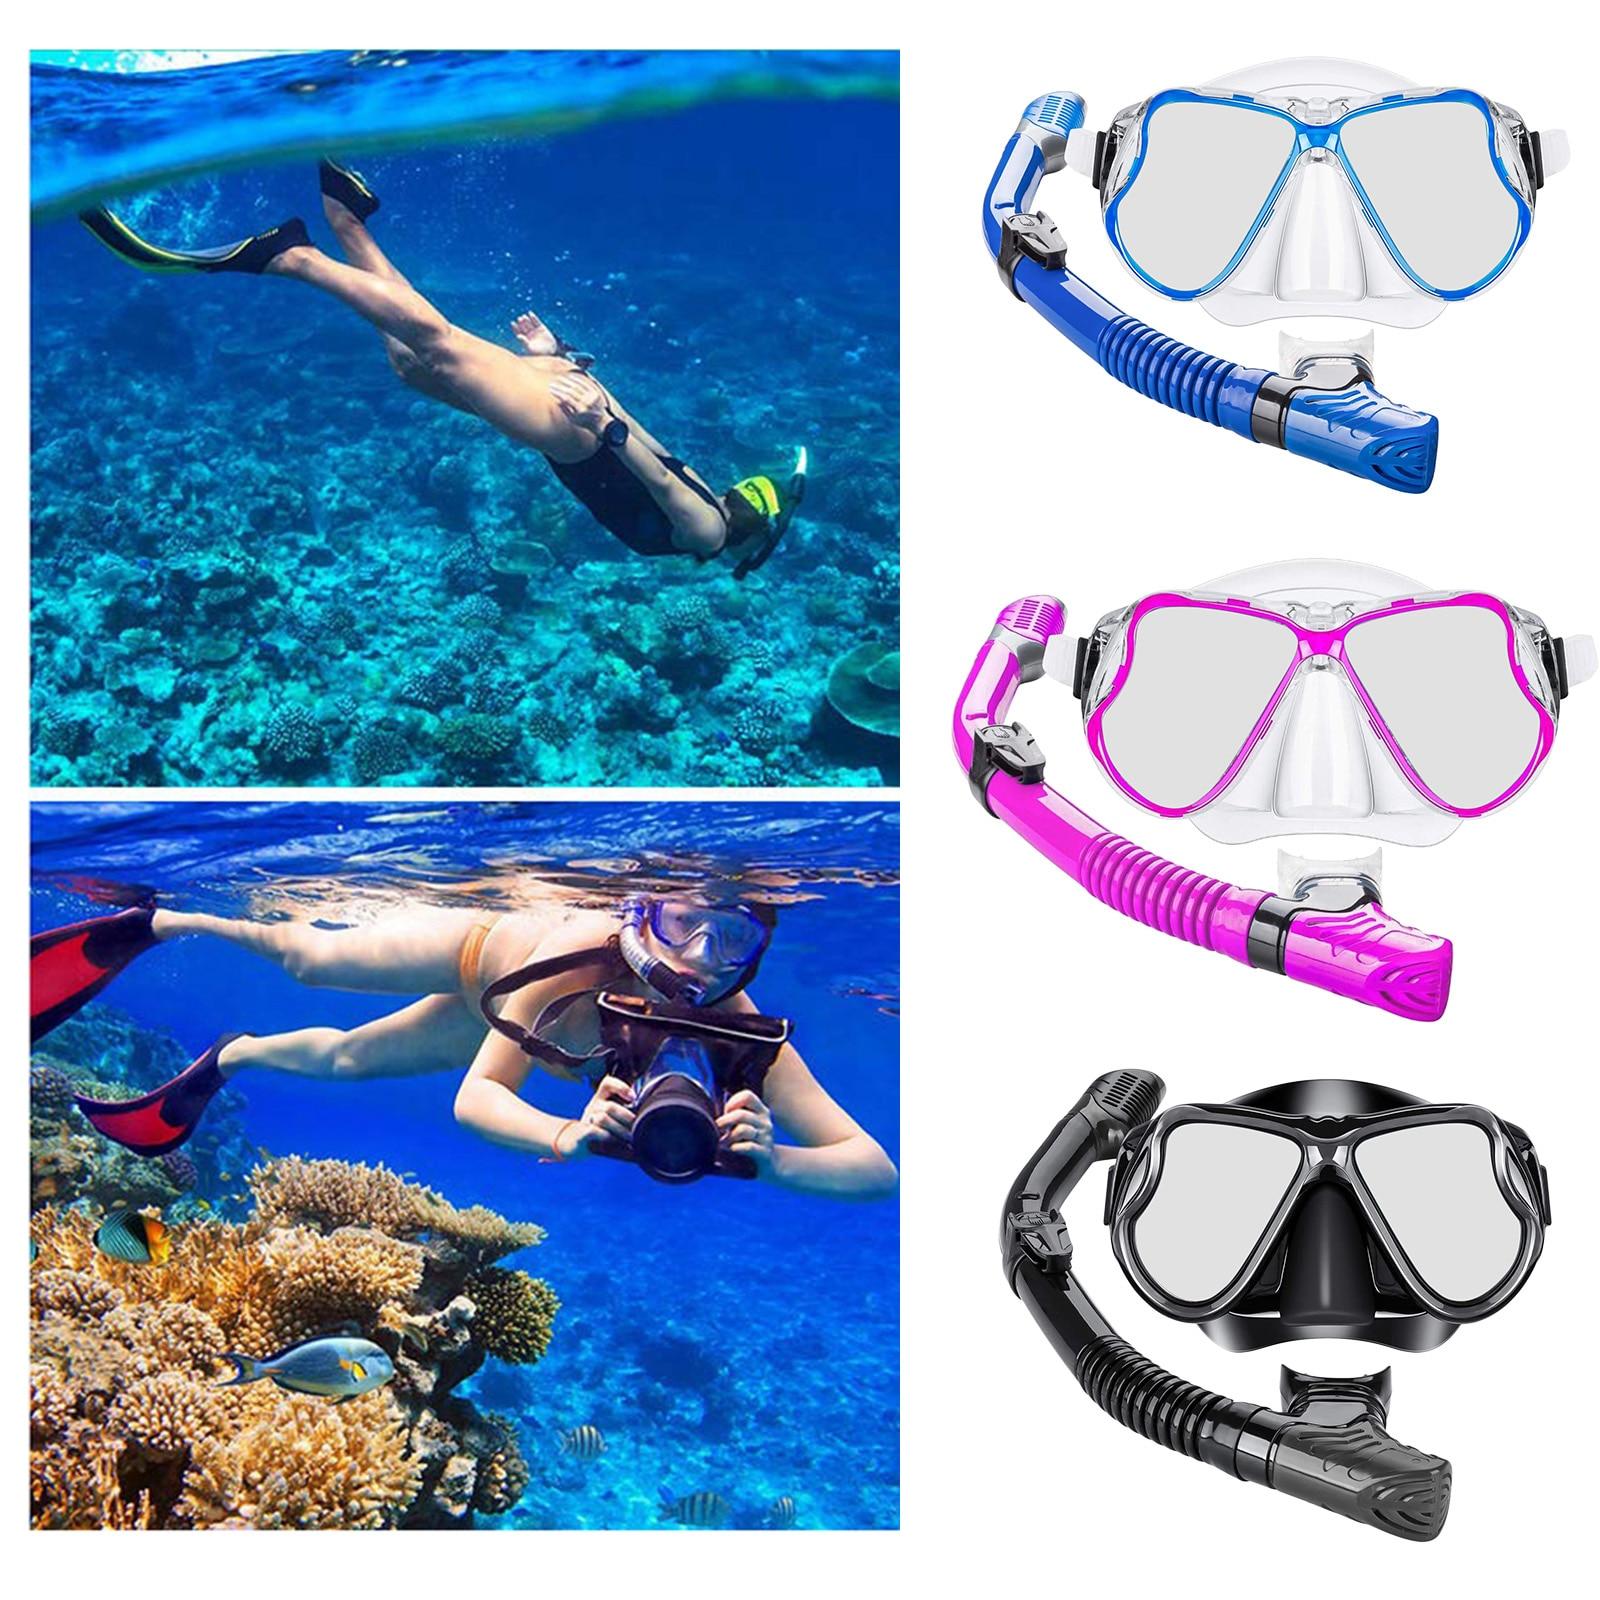 Dry Snorkel Gear Tube Scuba Snorkeling Spearfishing Package Dive Mask Set